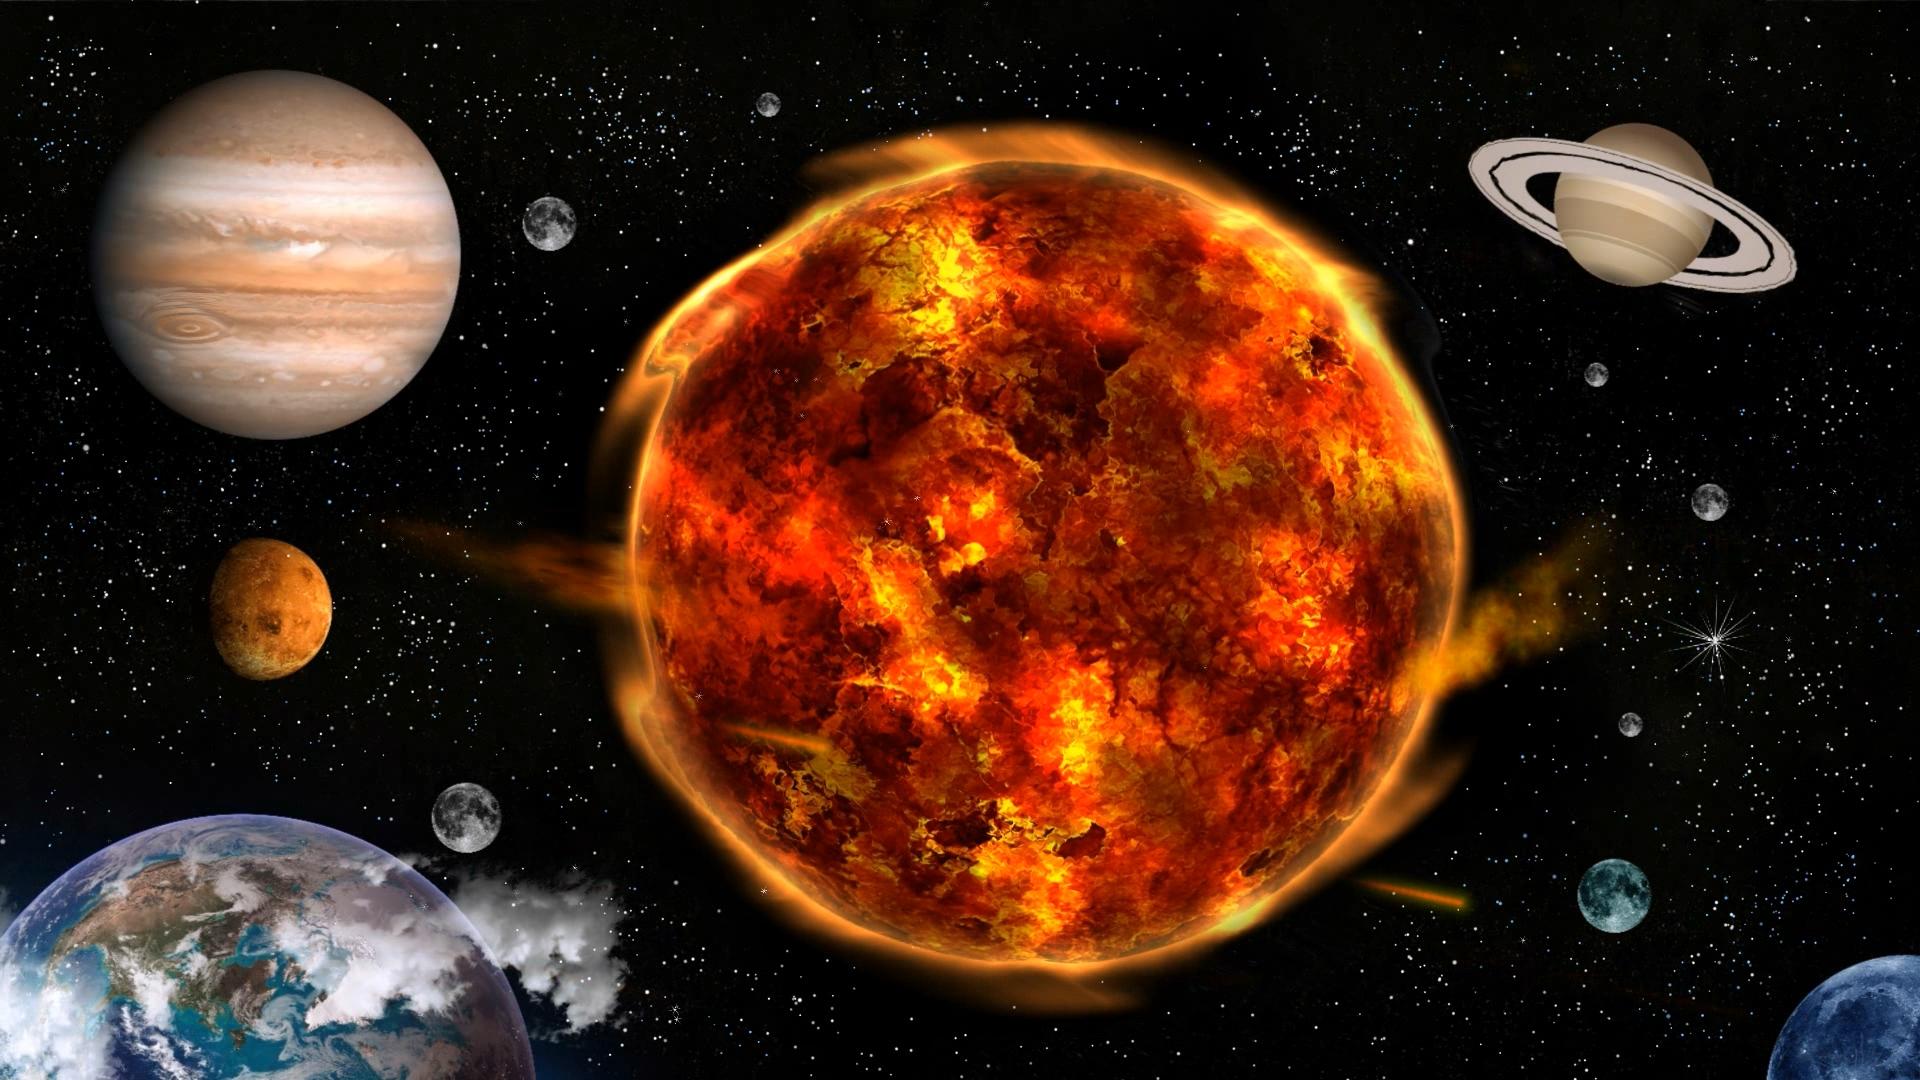 WinCustomize: Explore : Dream : Solar System Gone Wild